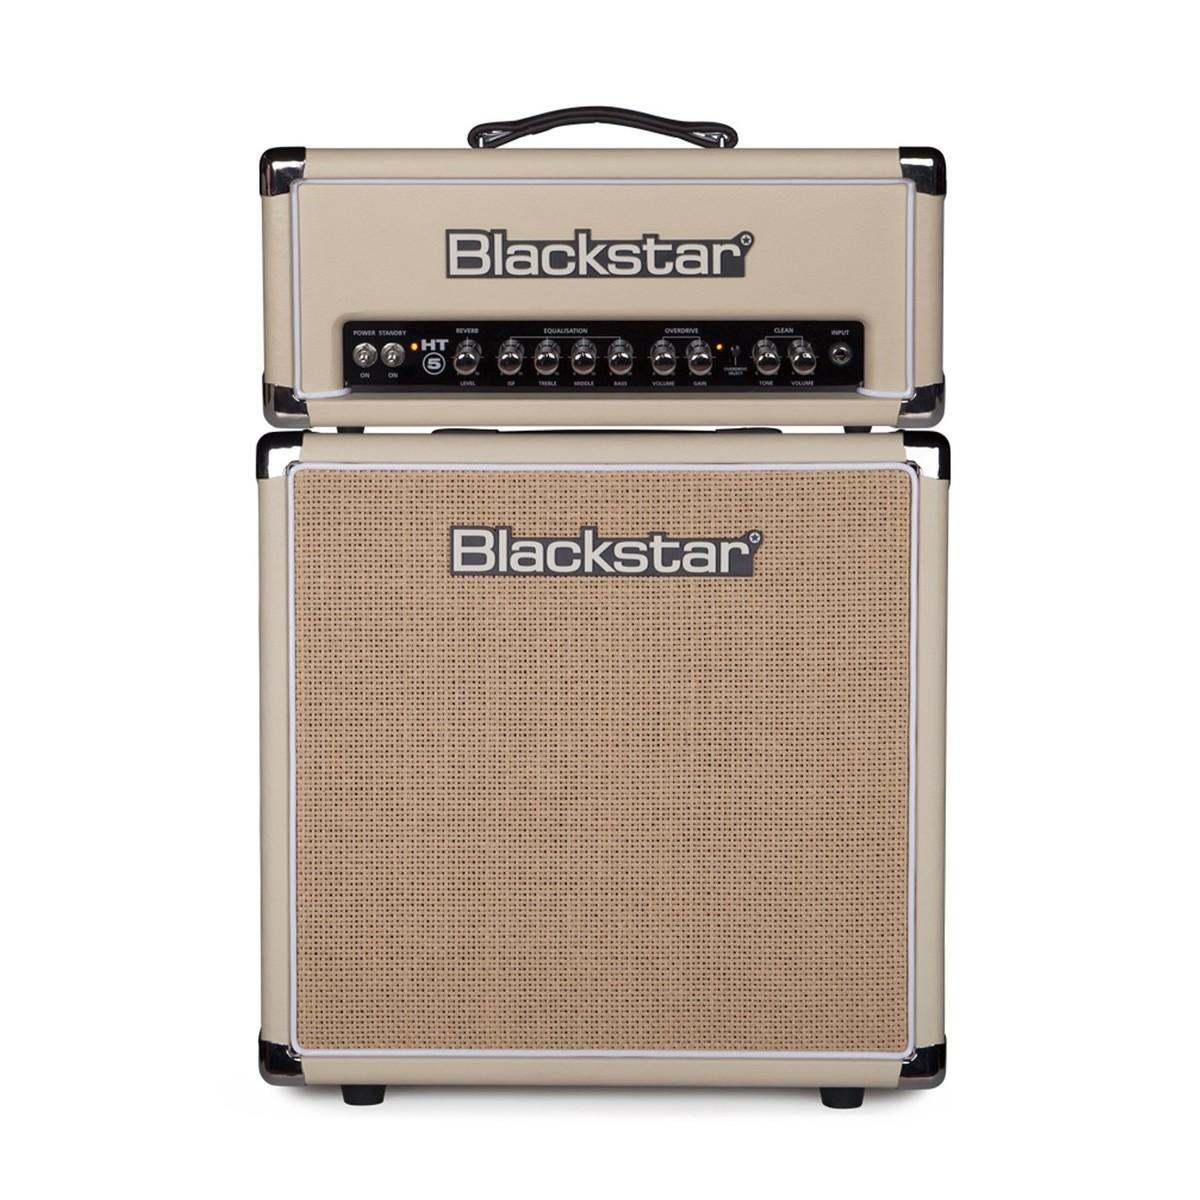 blackstar ht 5r head ht 112 1x12 cab bundle blonde gear4music. Black Bedroom Furniture Sets. Home Design Ideas